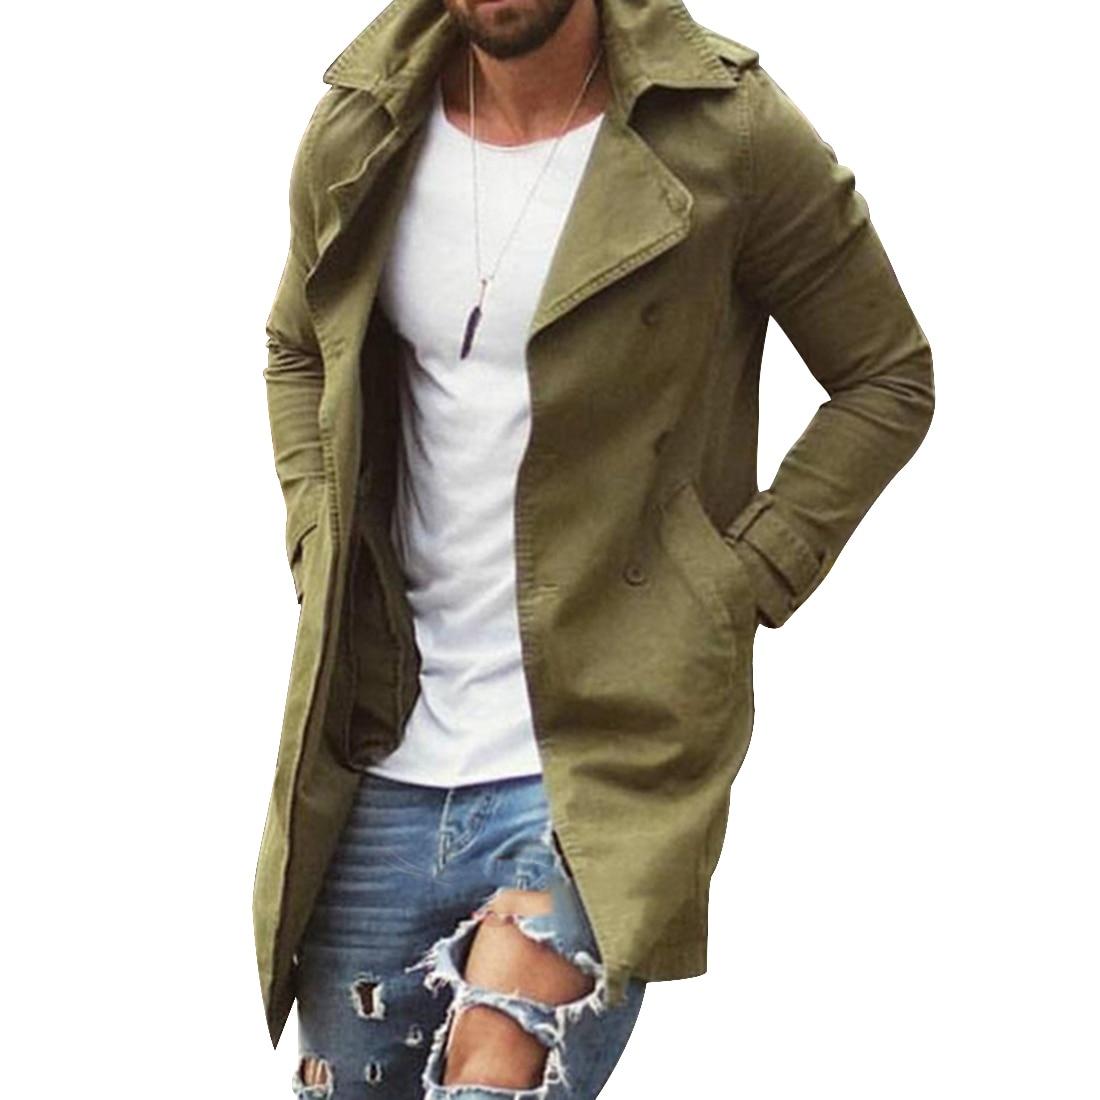 Spring Autumn Men Trench Coat Jacket Slim Fit Plus Size Black Outwear Business Long Windproof Overcoat Jackets For Men 5